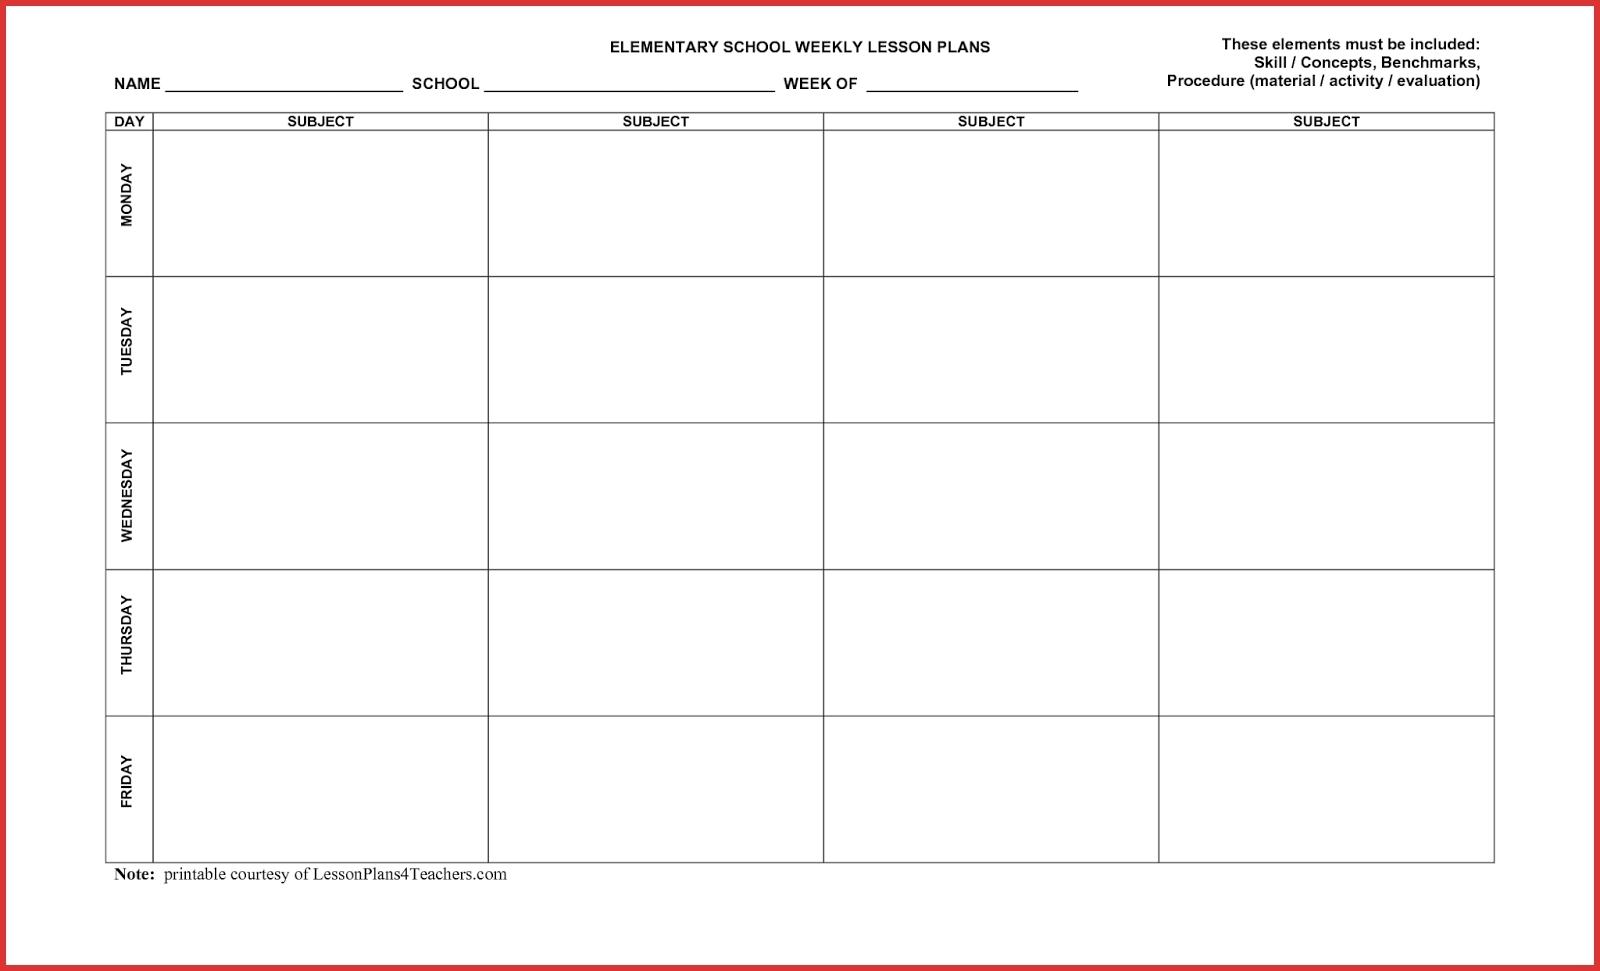 Day Weekly Calendar Template E2 80 93 Week Schedule Microsoft Word with 5 Day Week Calendar Printable